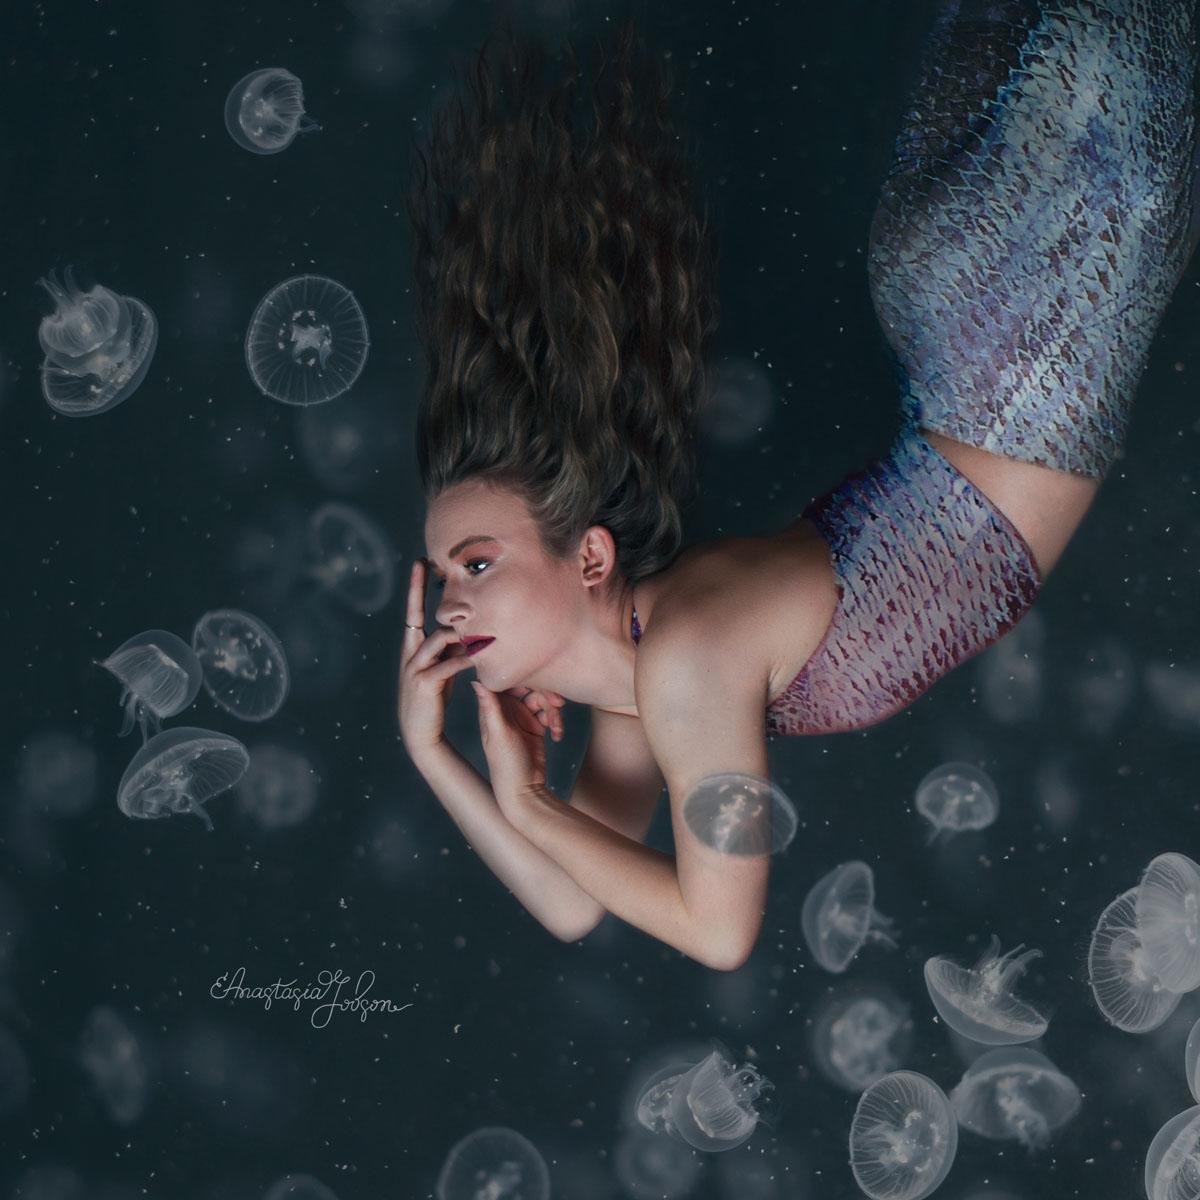 Underwater portrait, mermaid surrounded by jellyfish. Fine art photography, fine art portraits, fine art photo prints.